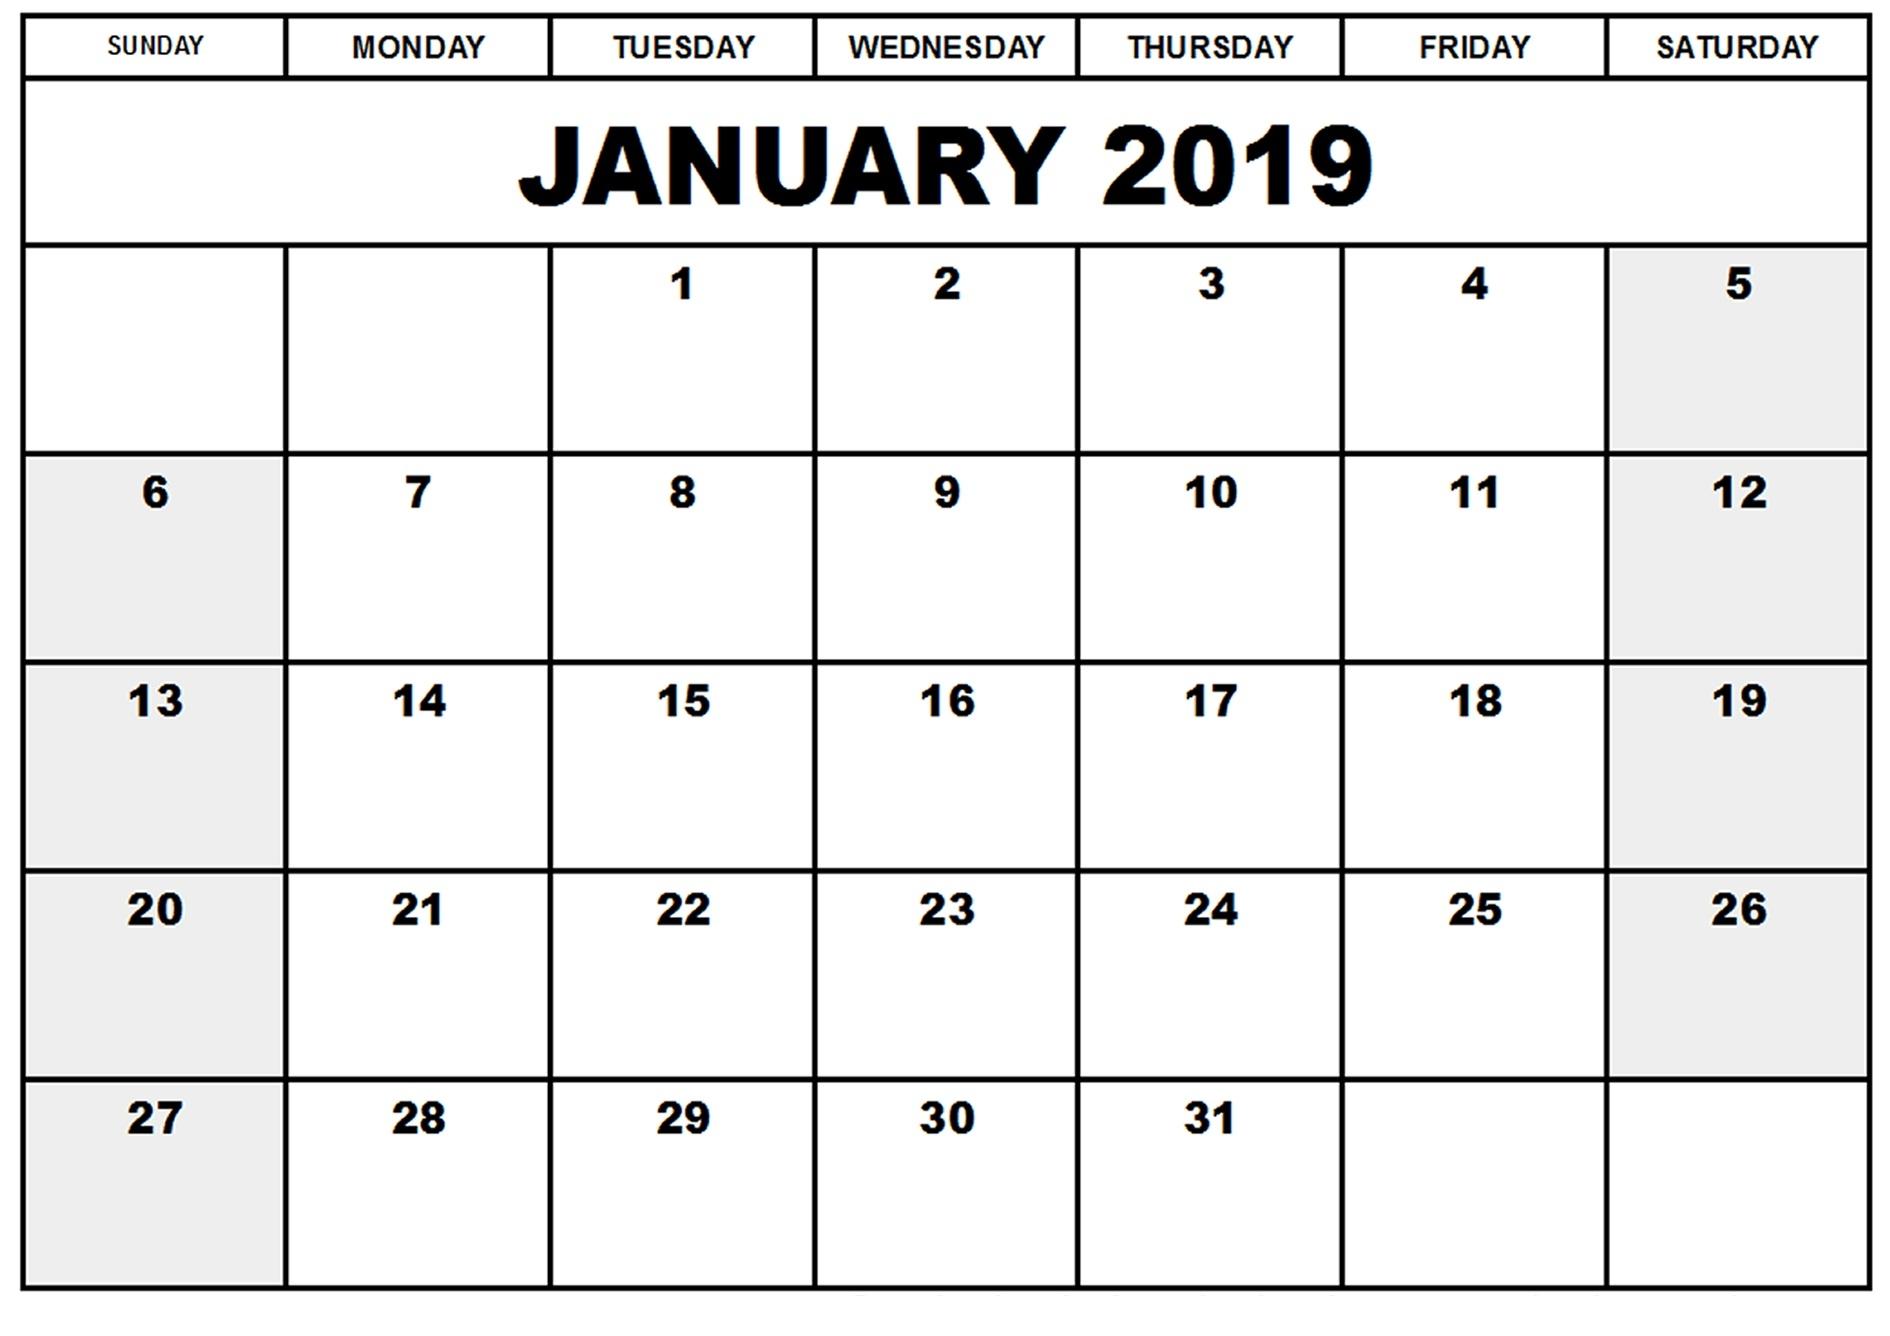 2019 January Calendar In Excel